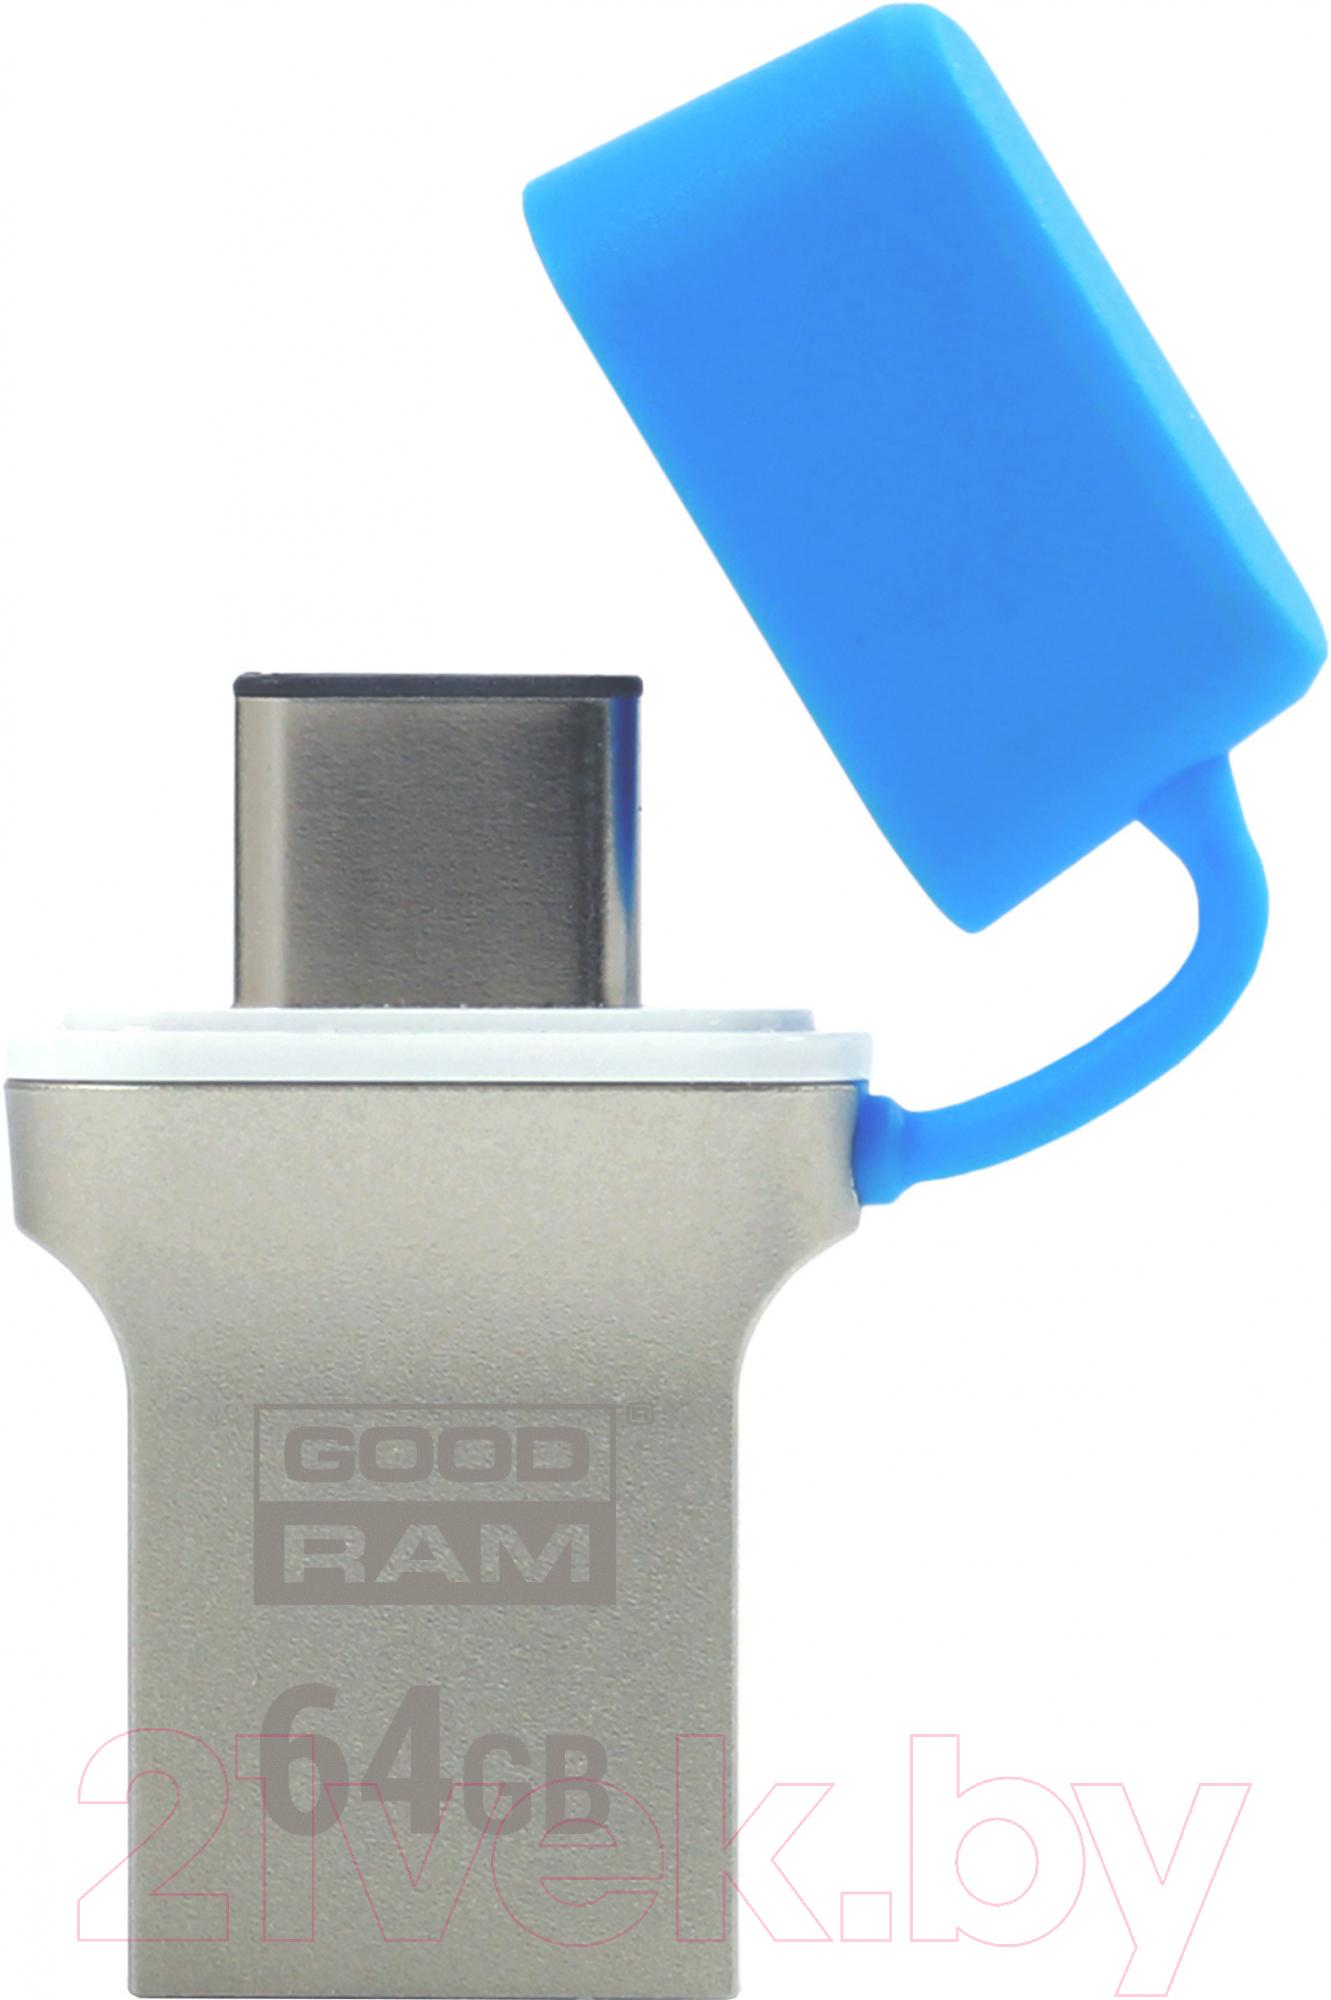 Купить Usb flash накопитель Goodram, ODD3 64GB Blue (ODD3-0640B0R11), Китай